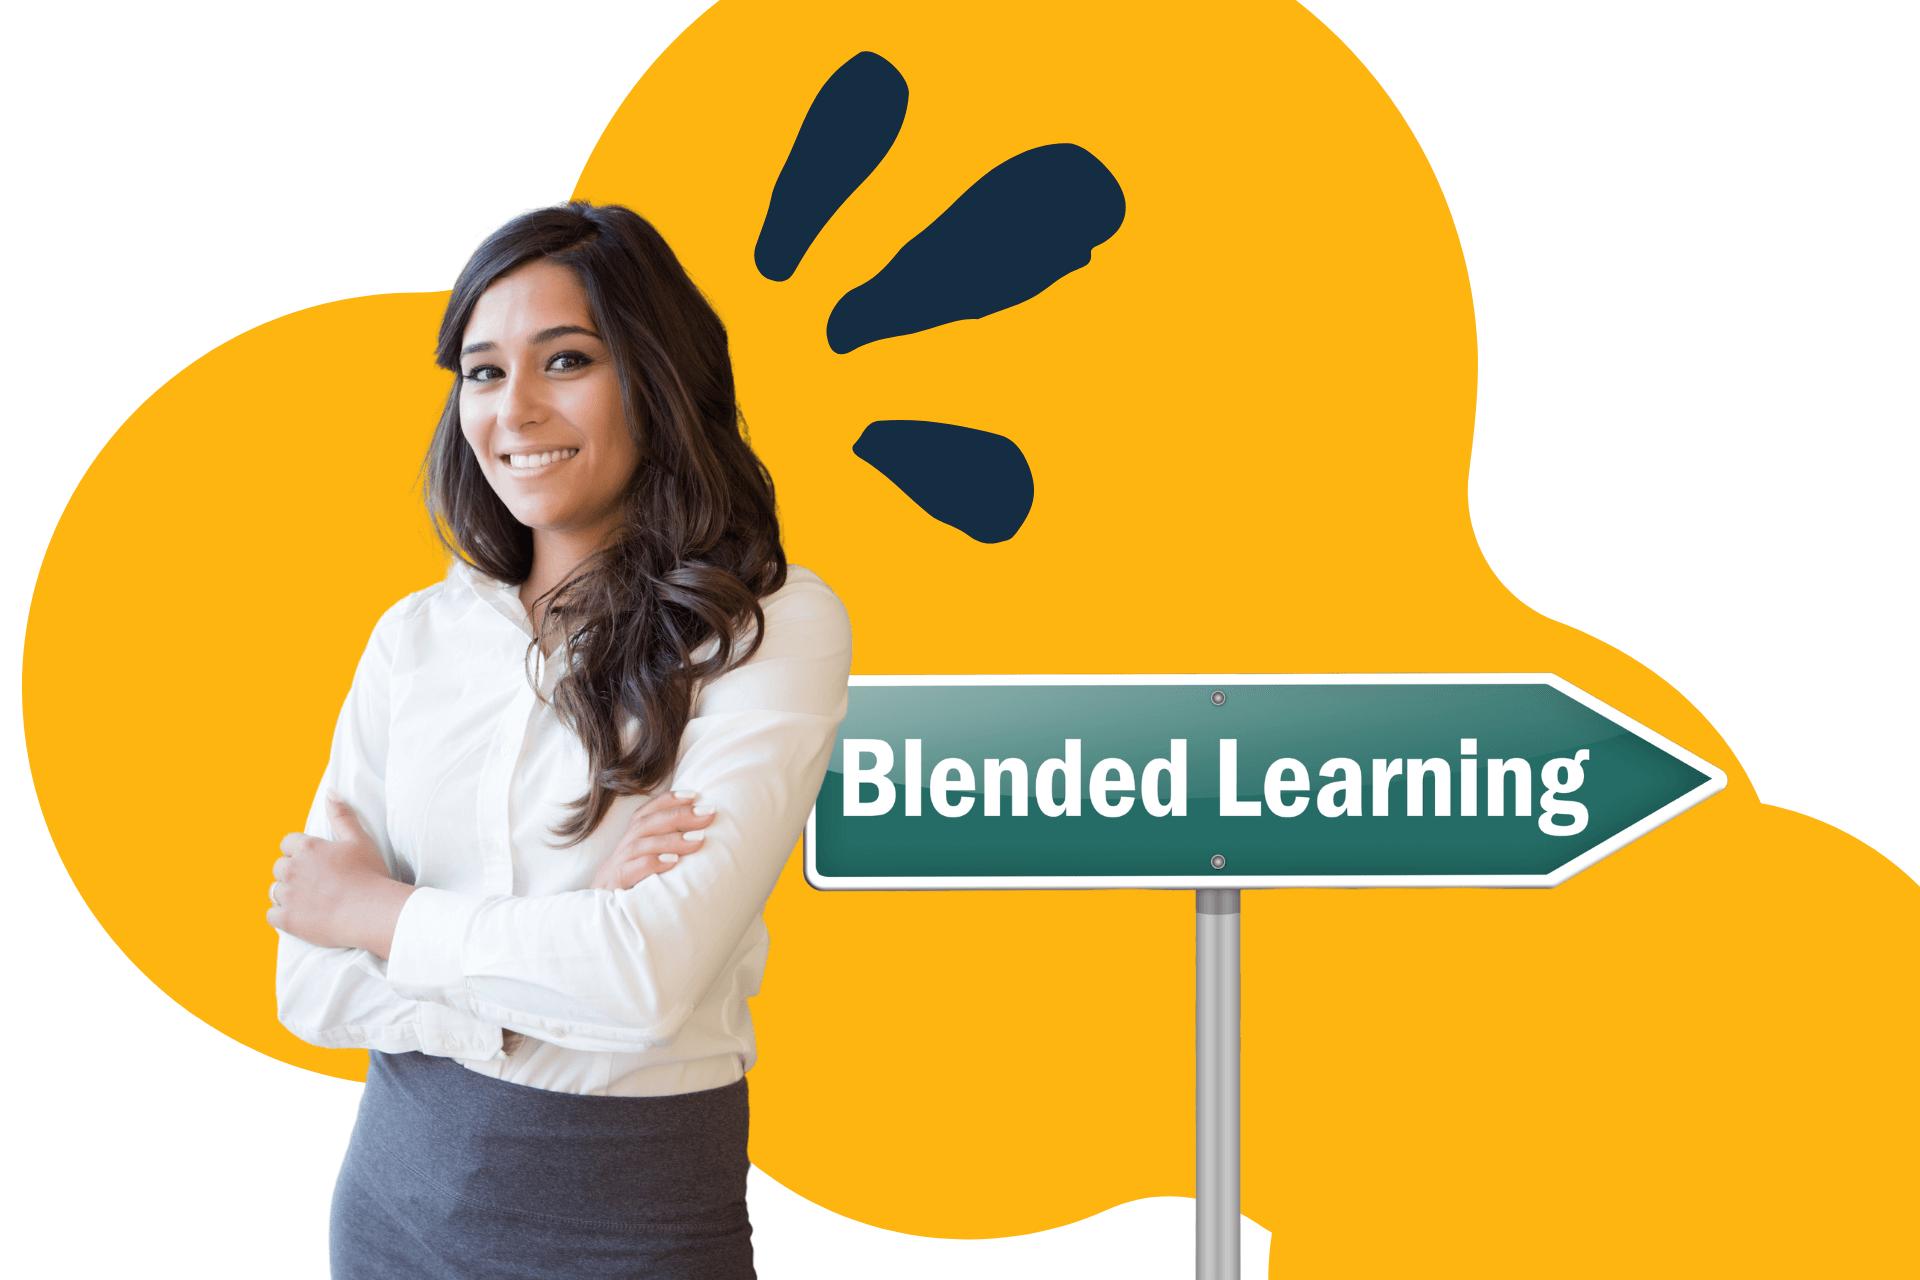 blended learning, avenir formation professionnelle